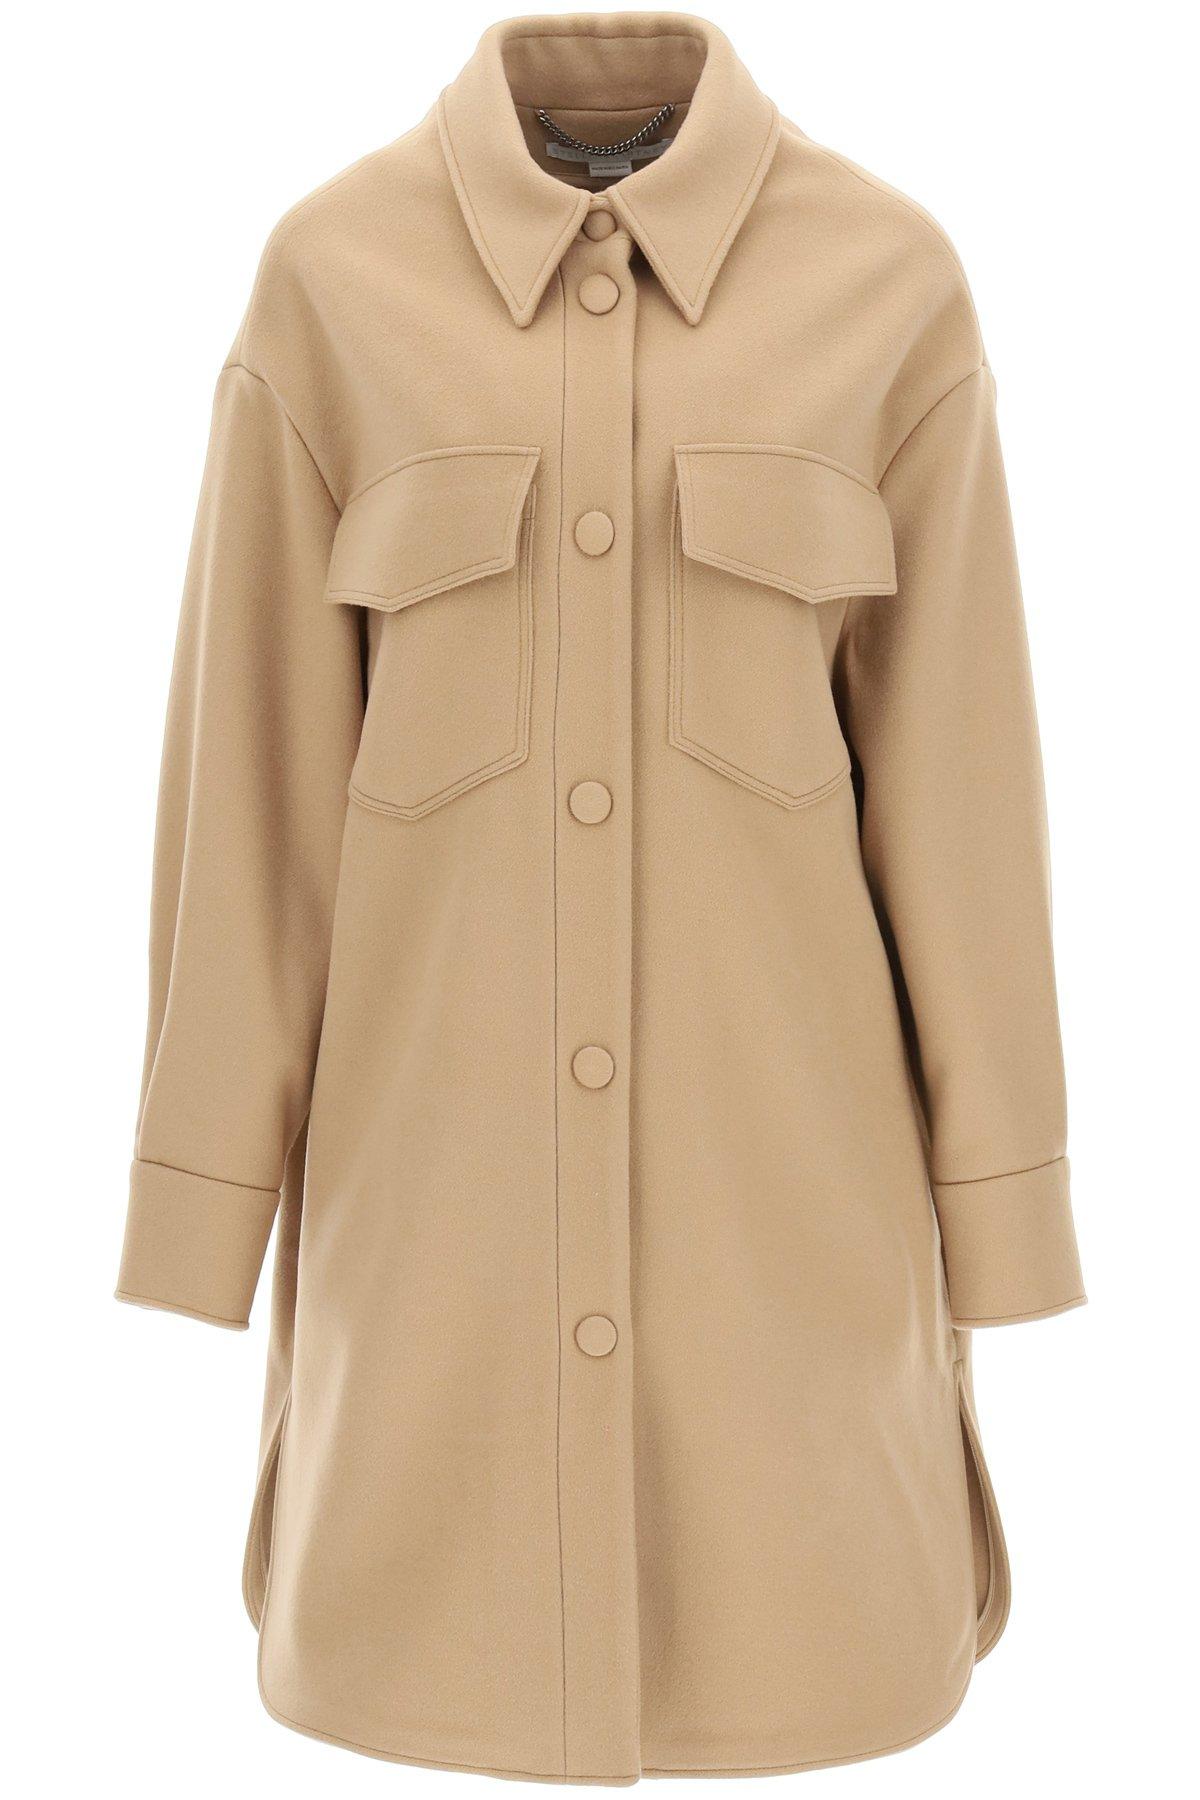 Stella mccartney cappotto kerry in lana